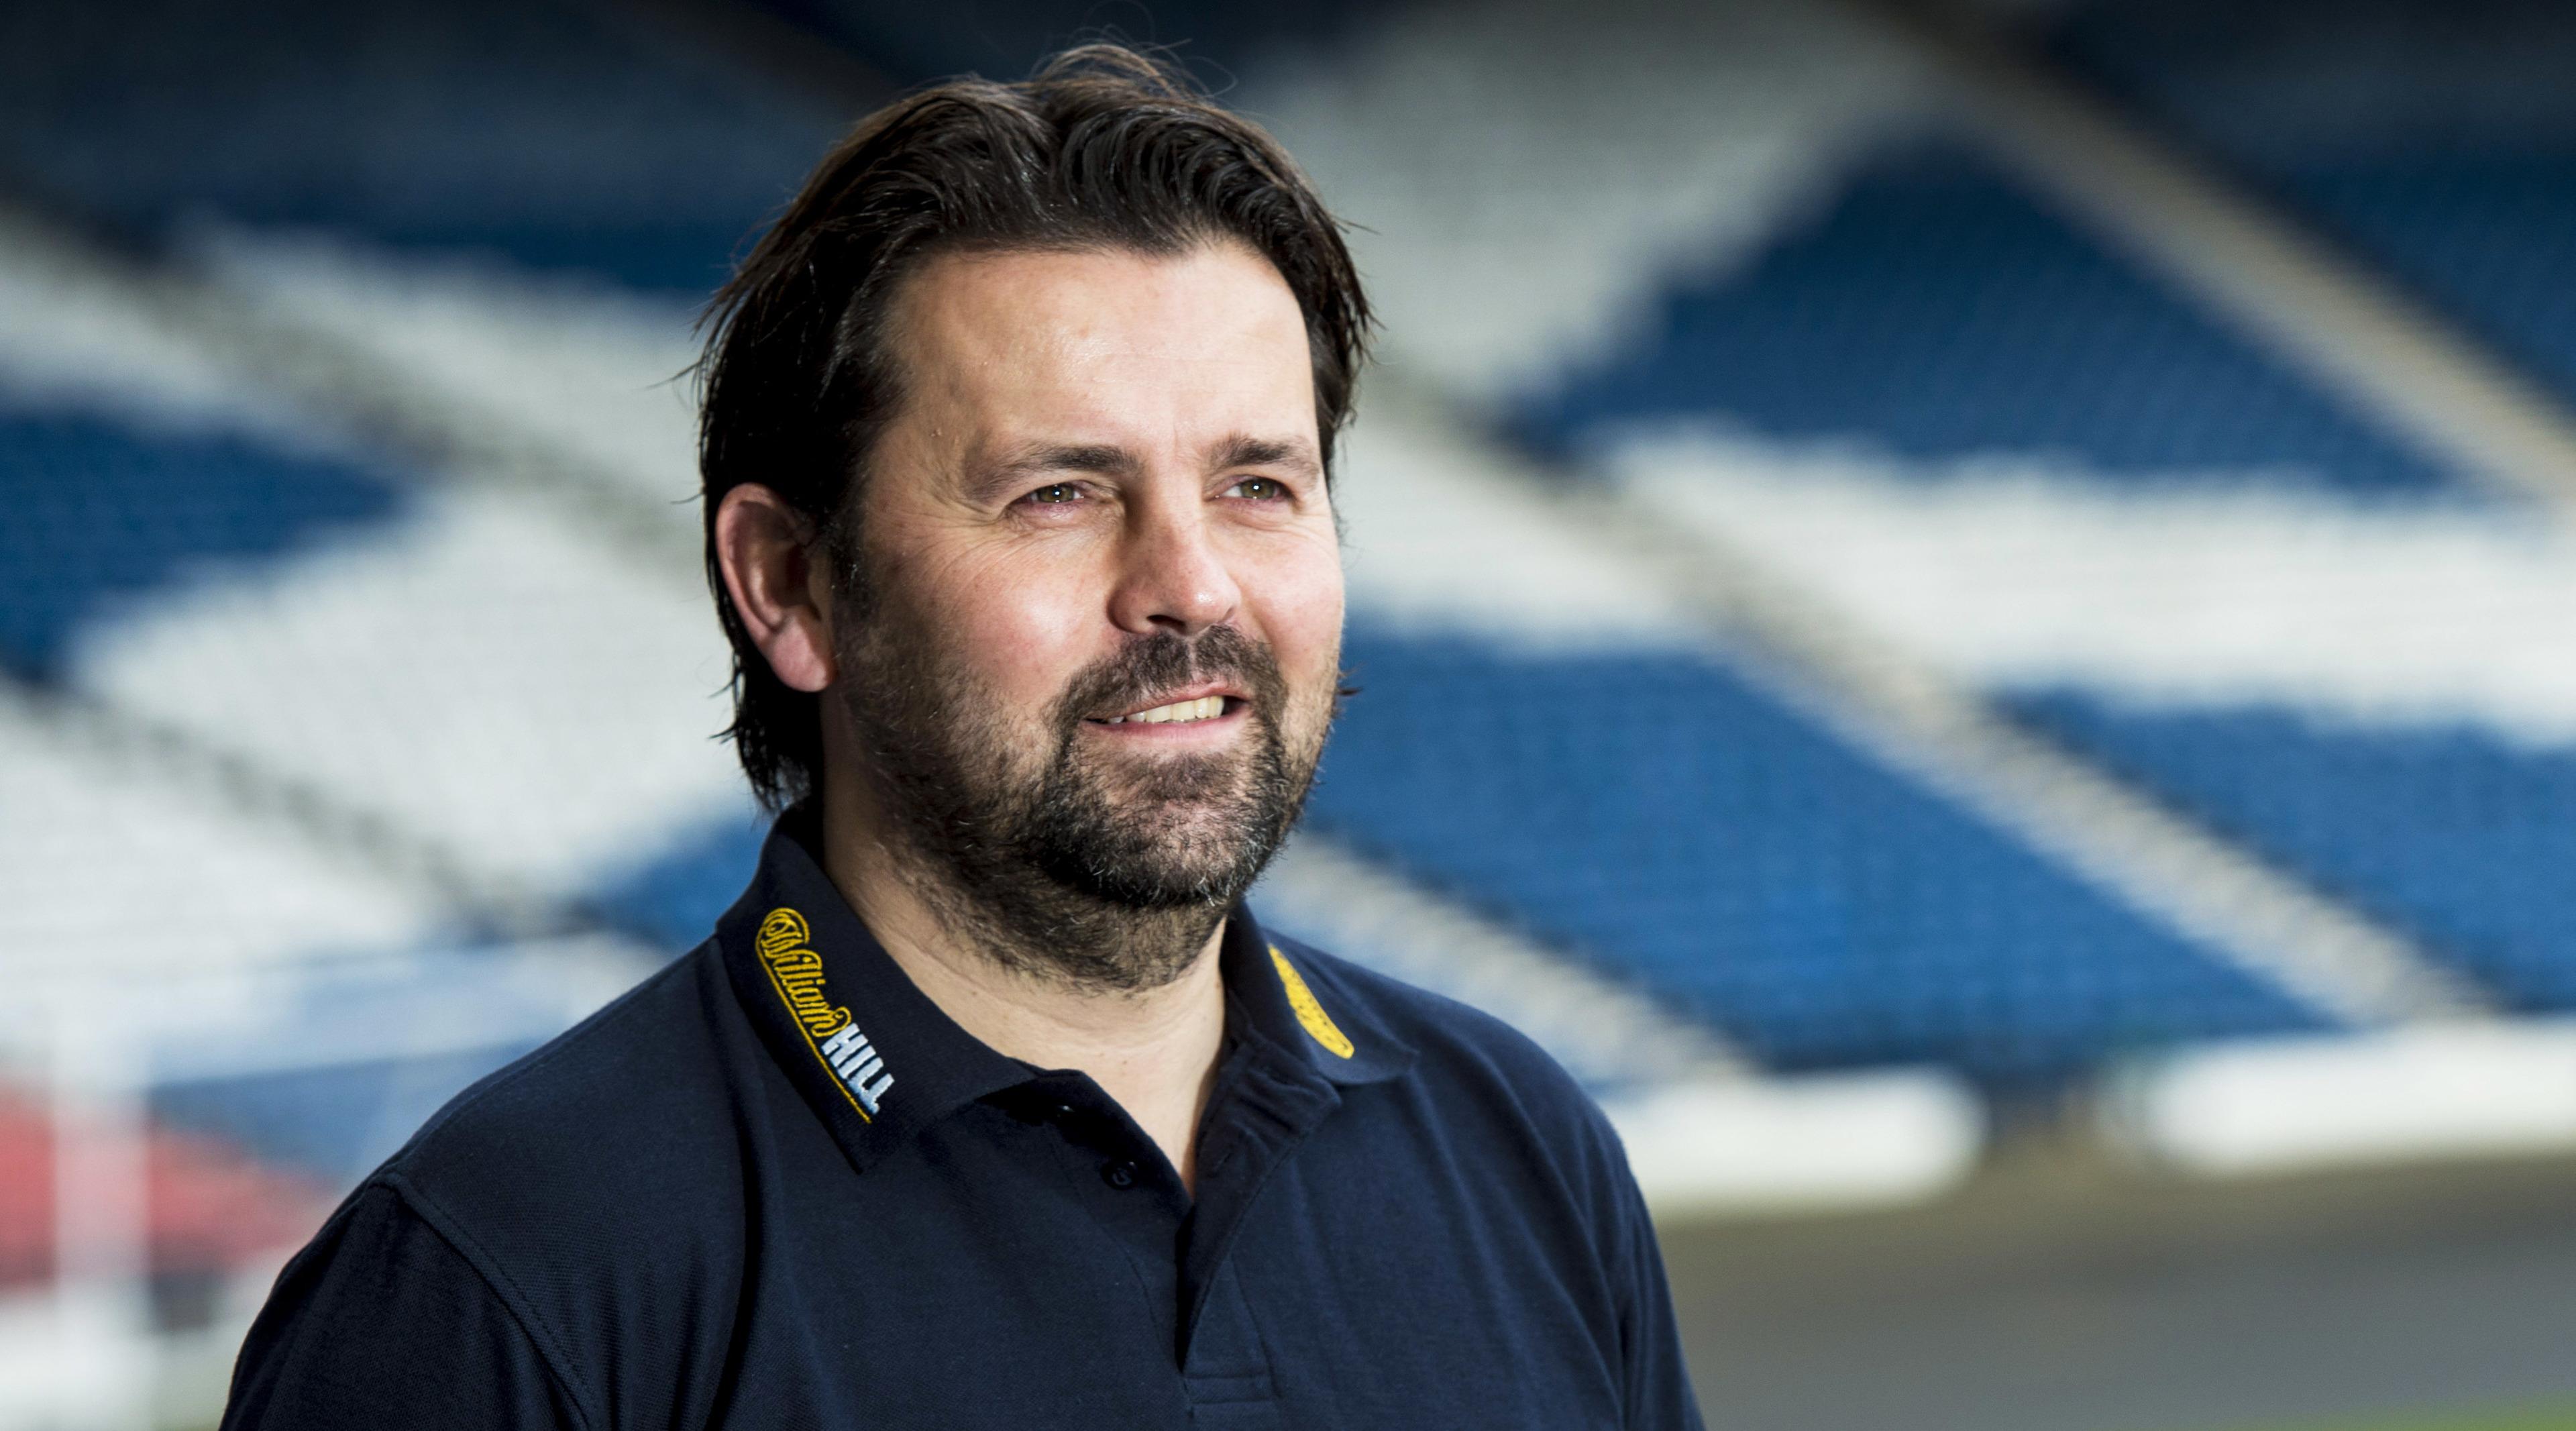 Dundee manager and former Scotland international Paul Hartley at Hampden